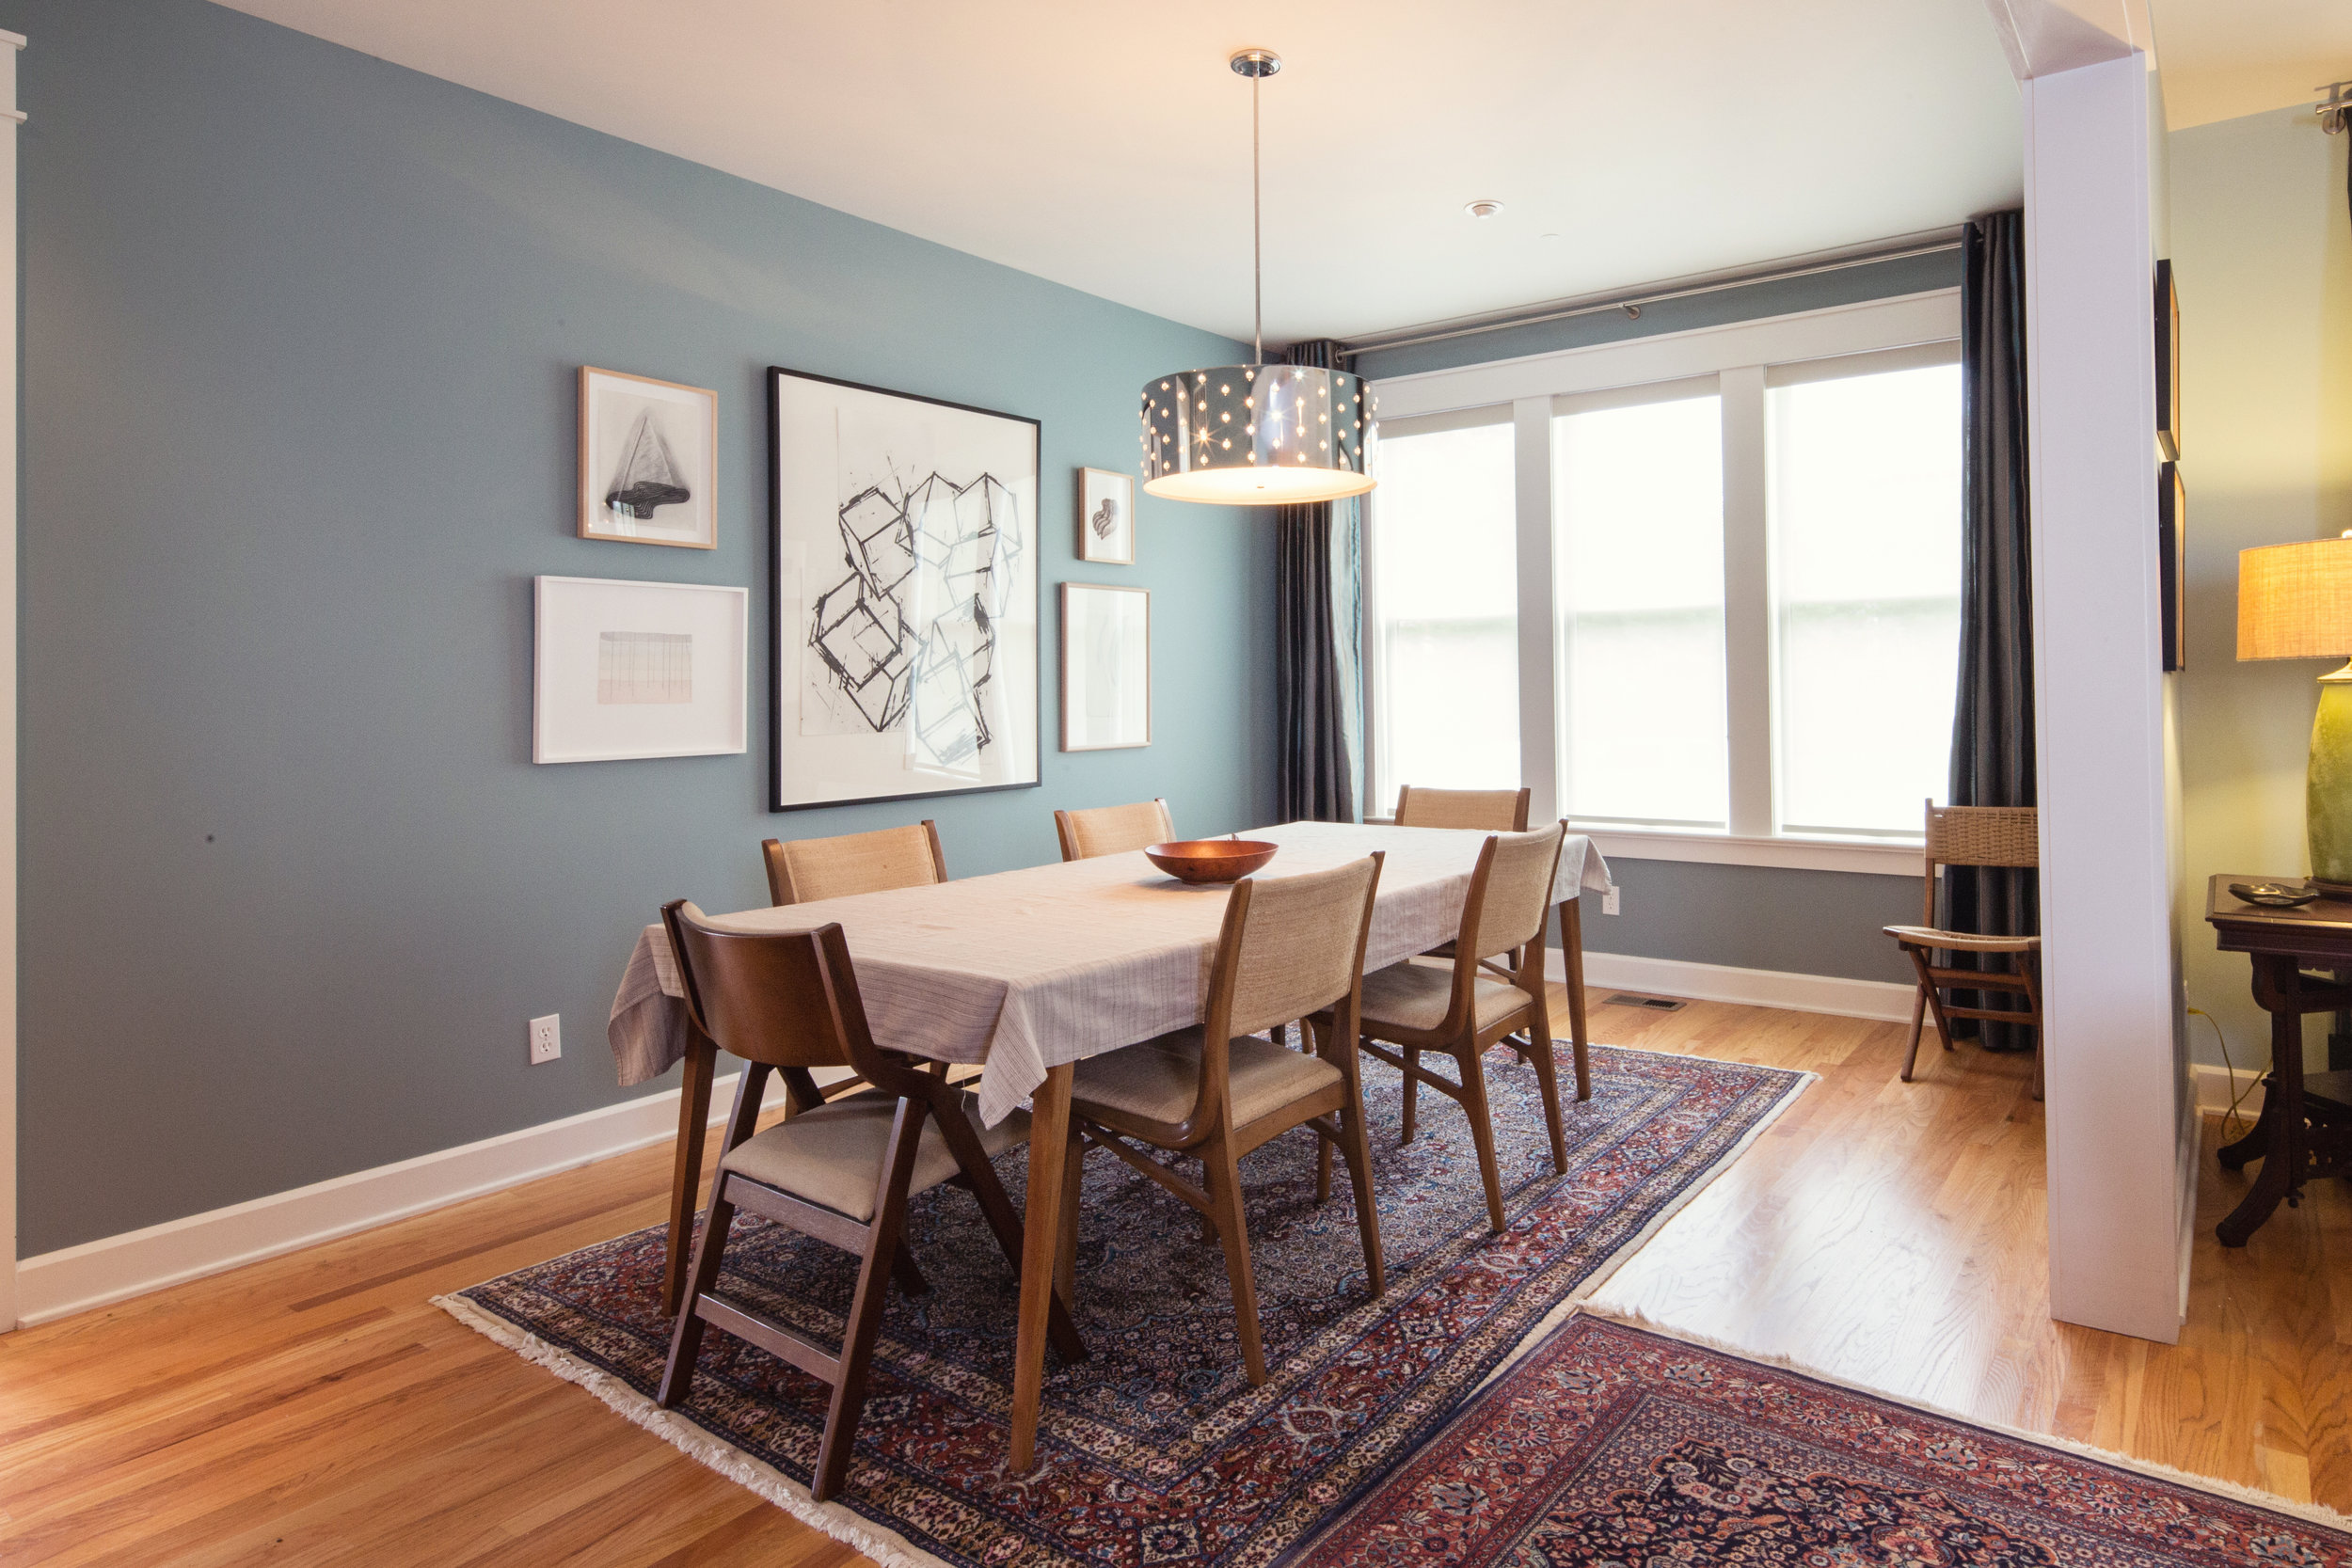 color-theory-painting-interior-beautiful-5.jpg